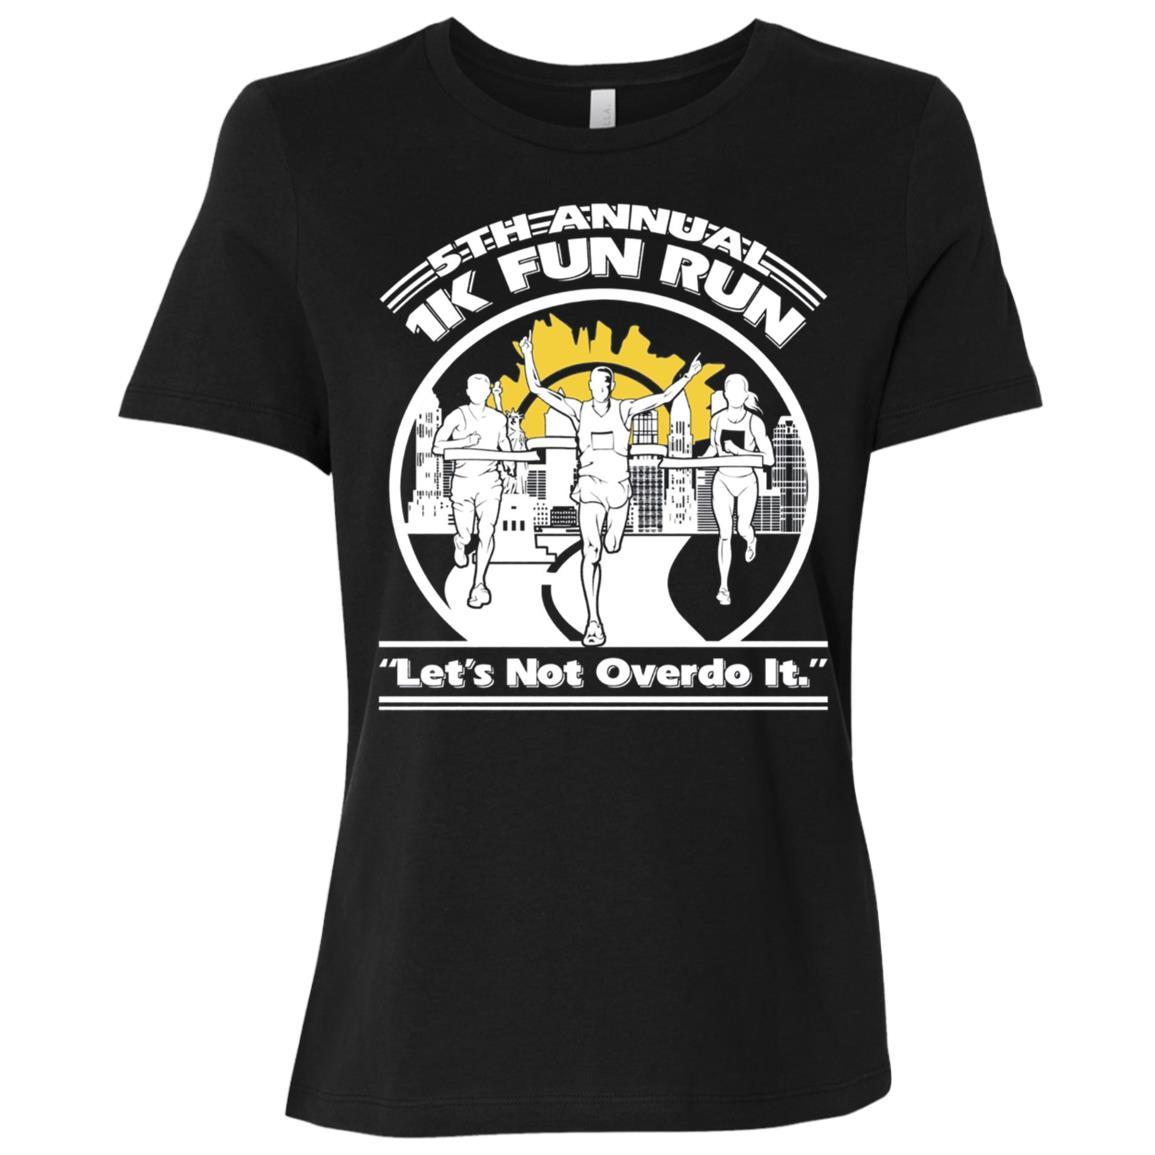 1K Fun Run 5th Annual Women Short Sleeve T-Shirt